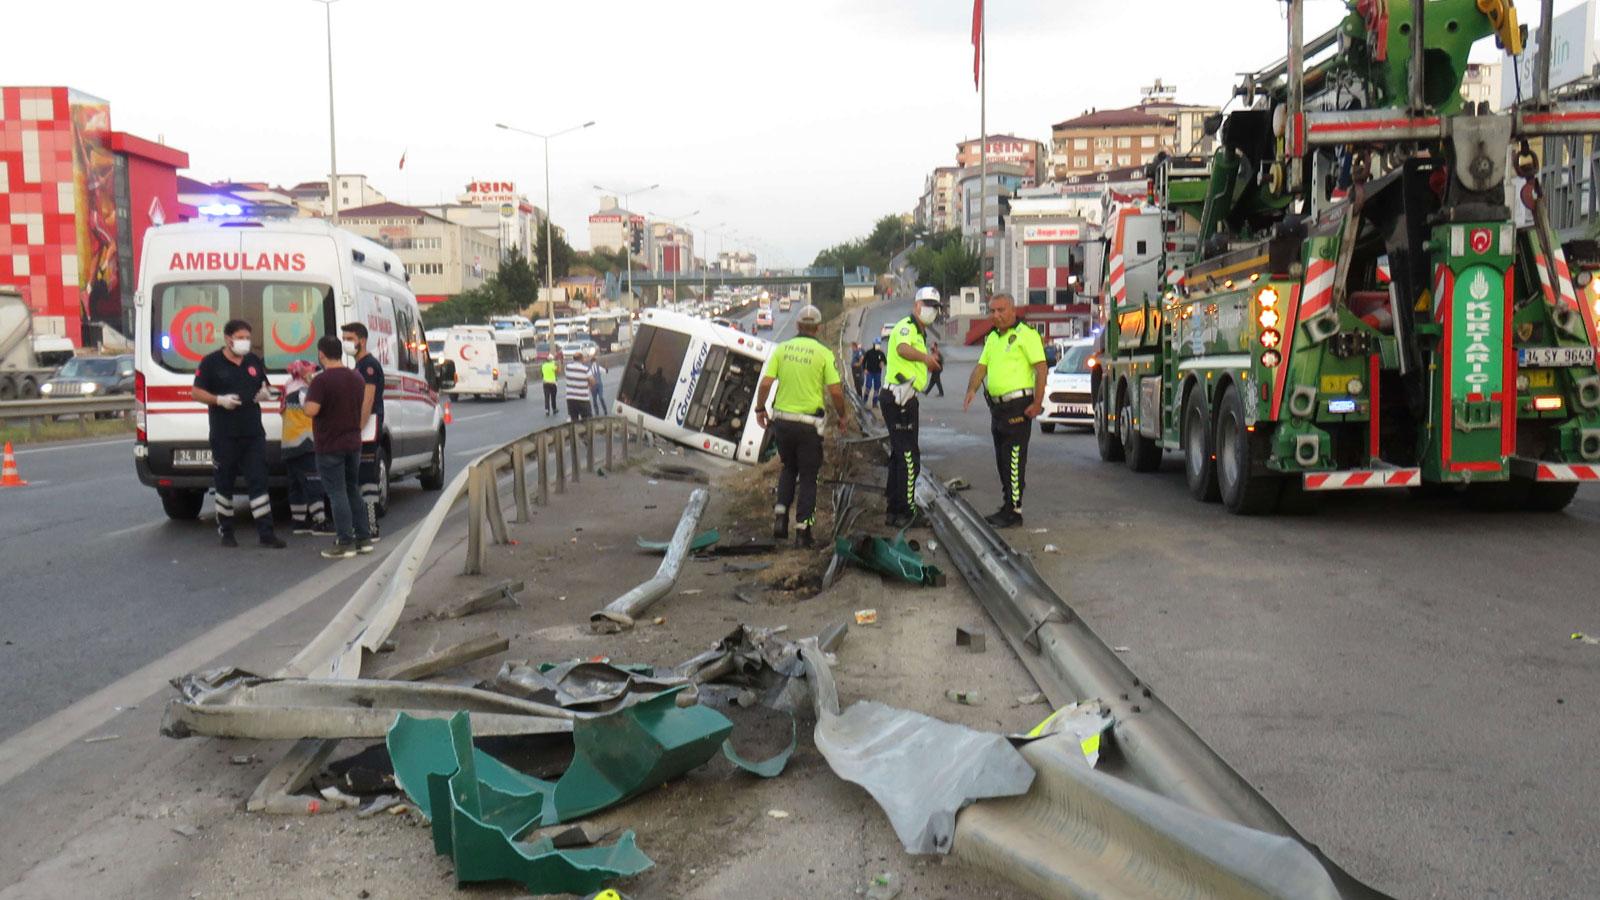 Yolcu otobüsü devrildi: 1'i ağır, 11 yaralı